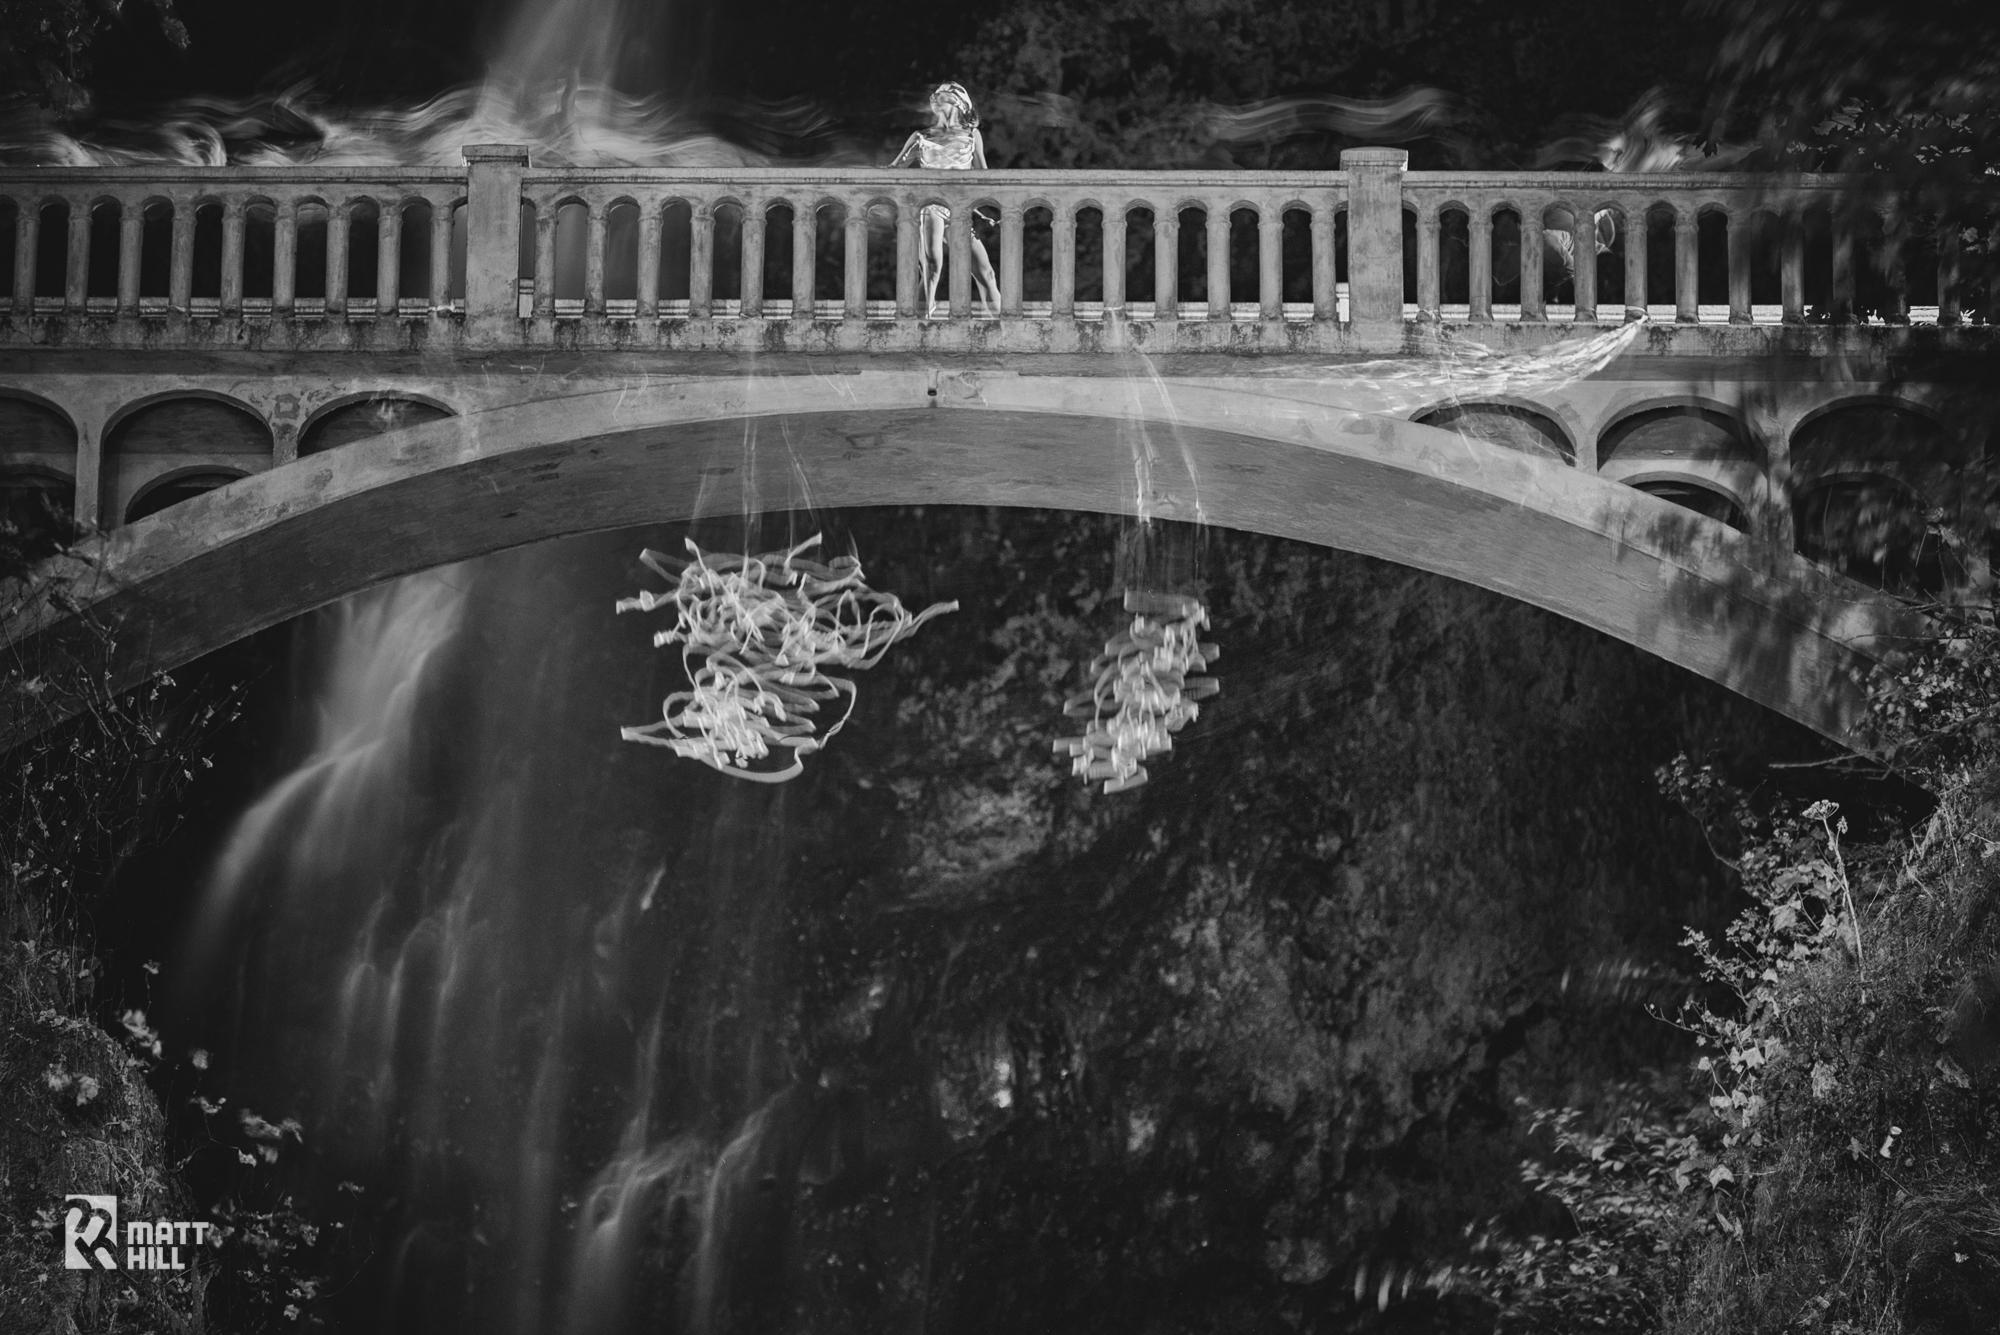 night-photography-multnomah-falls-oregon-matt-hill.jpg